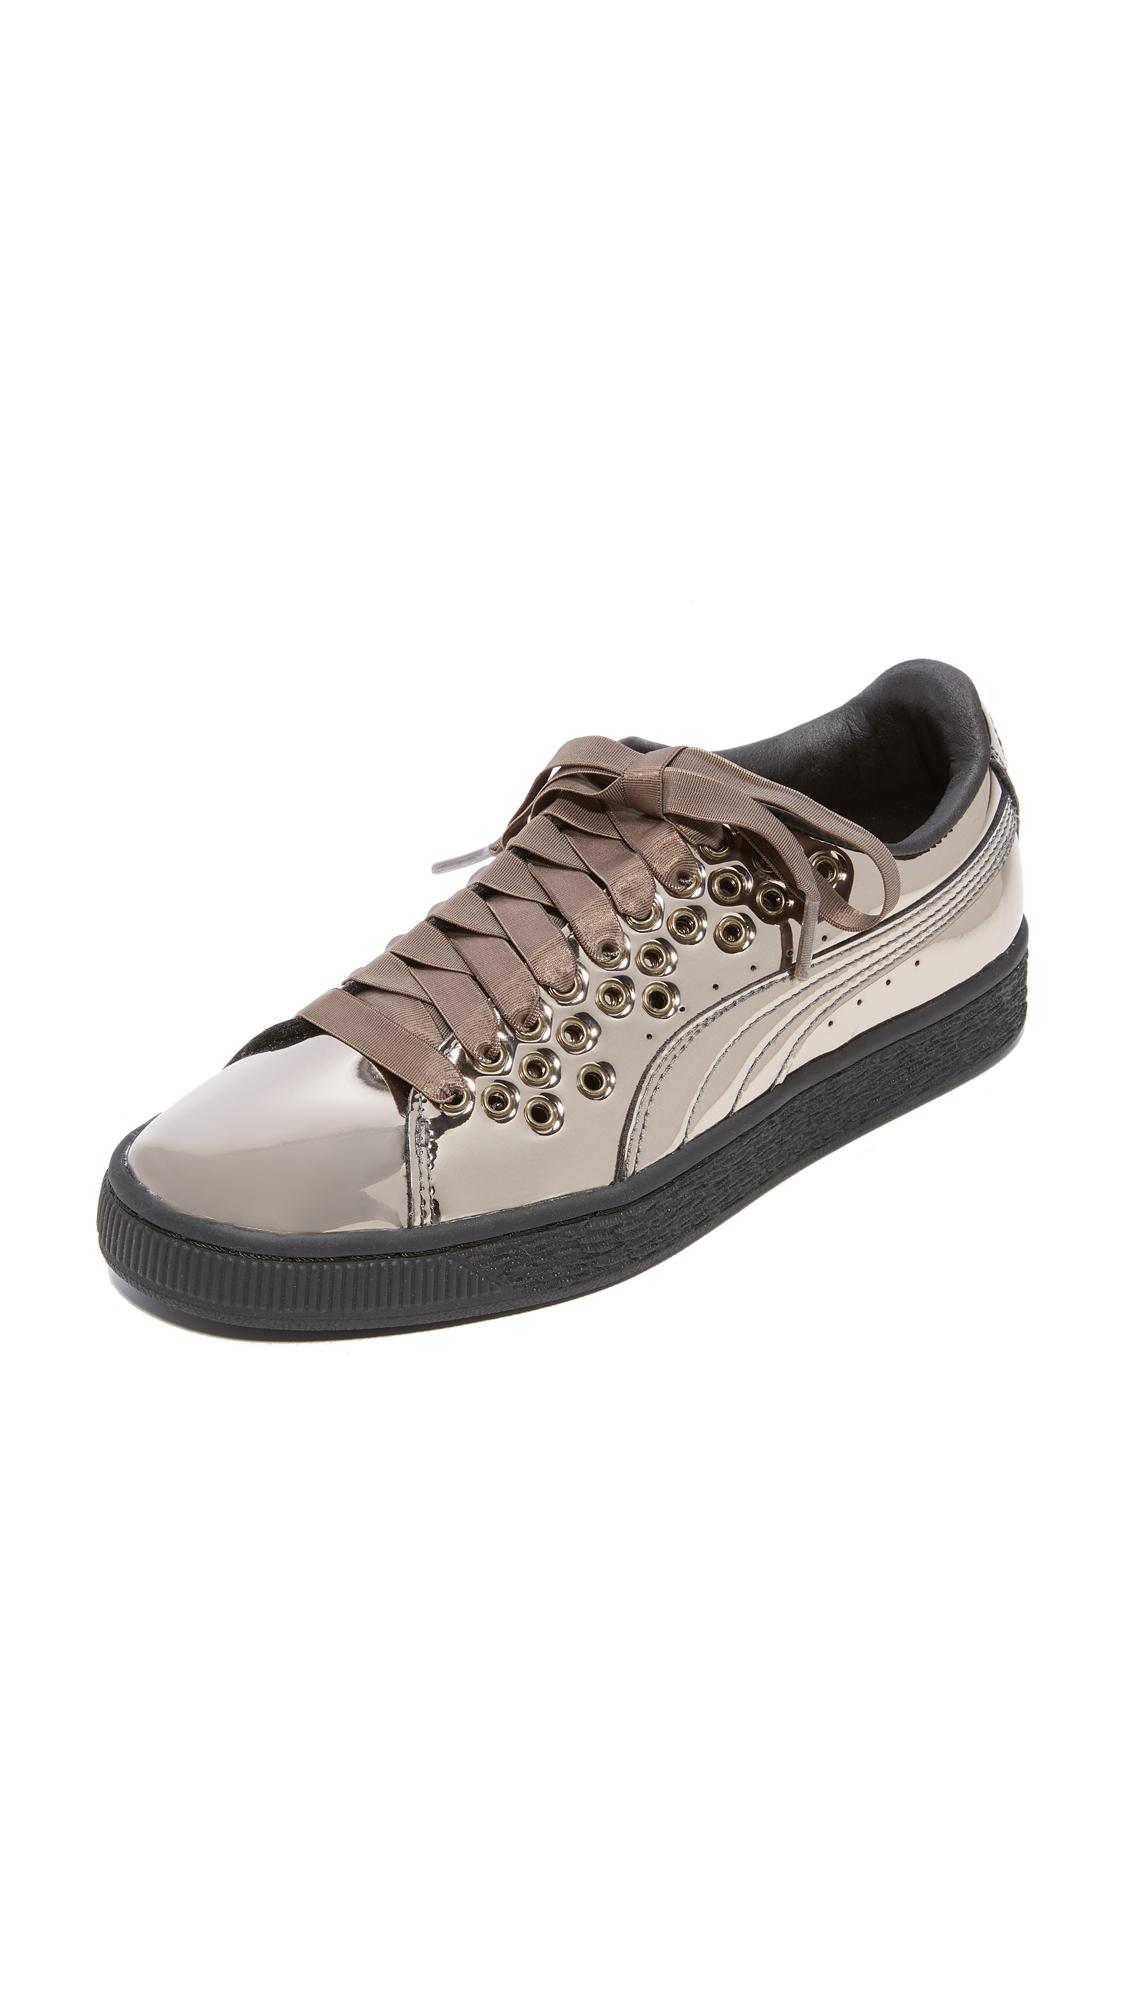 PUMA Basket XL Lace Select Sneakers - Black